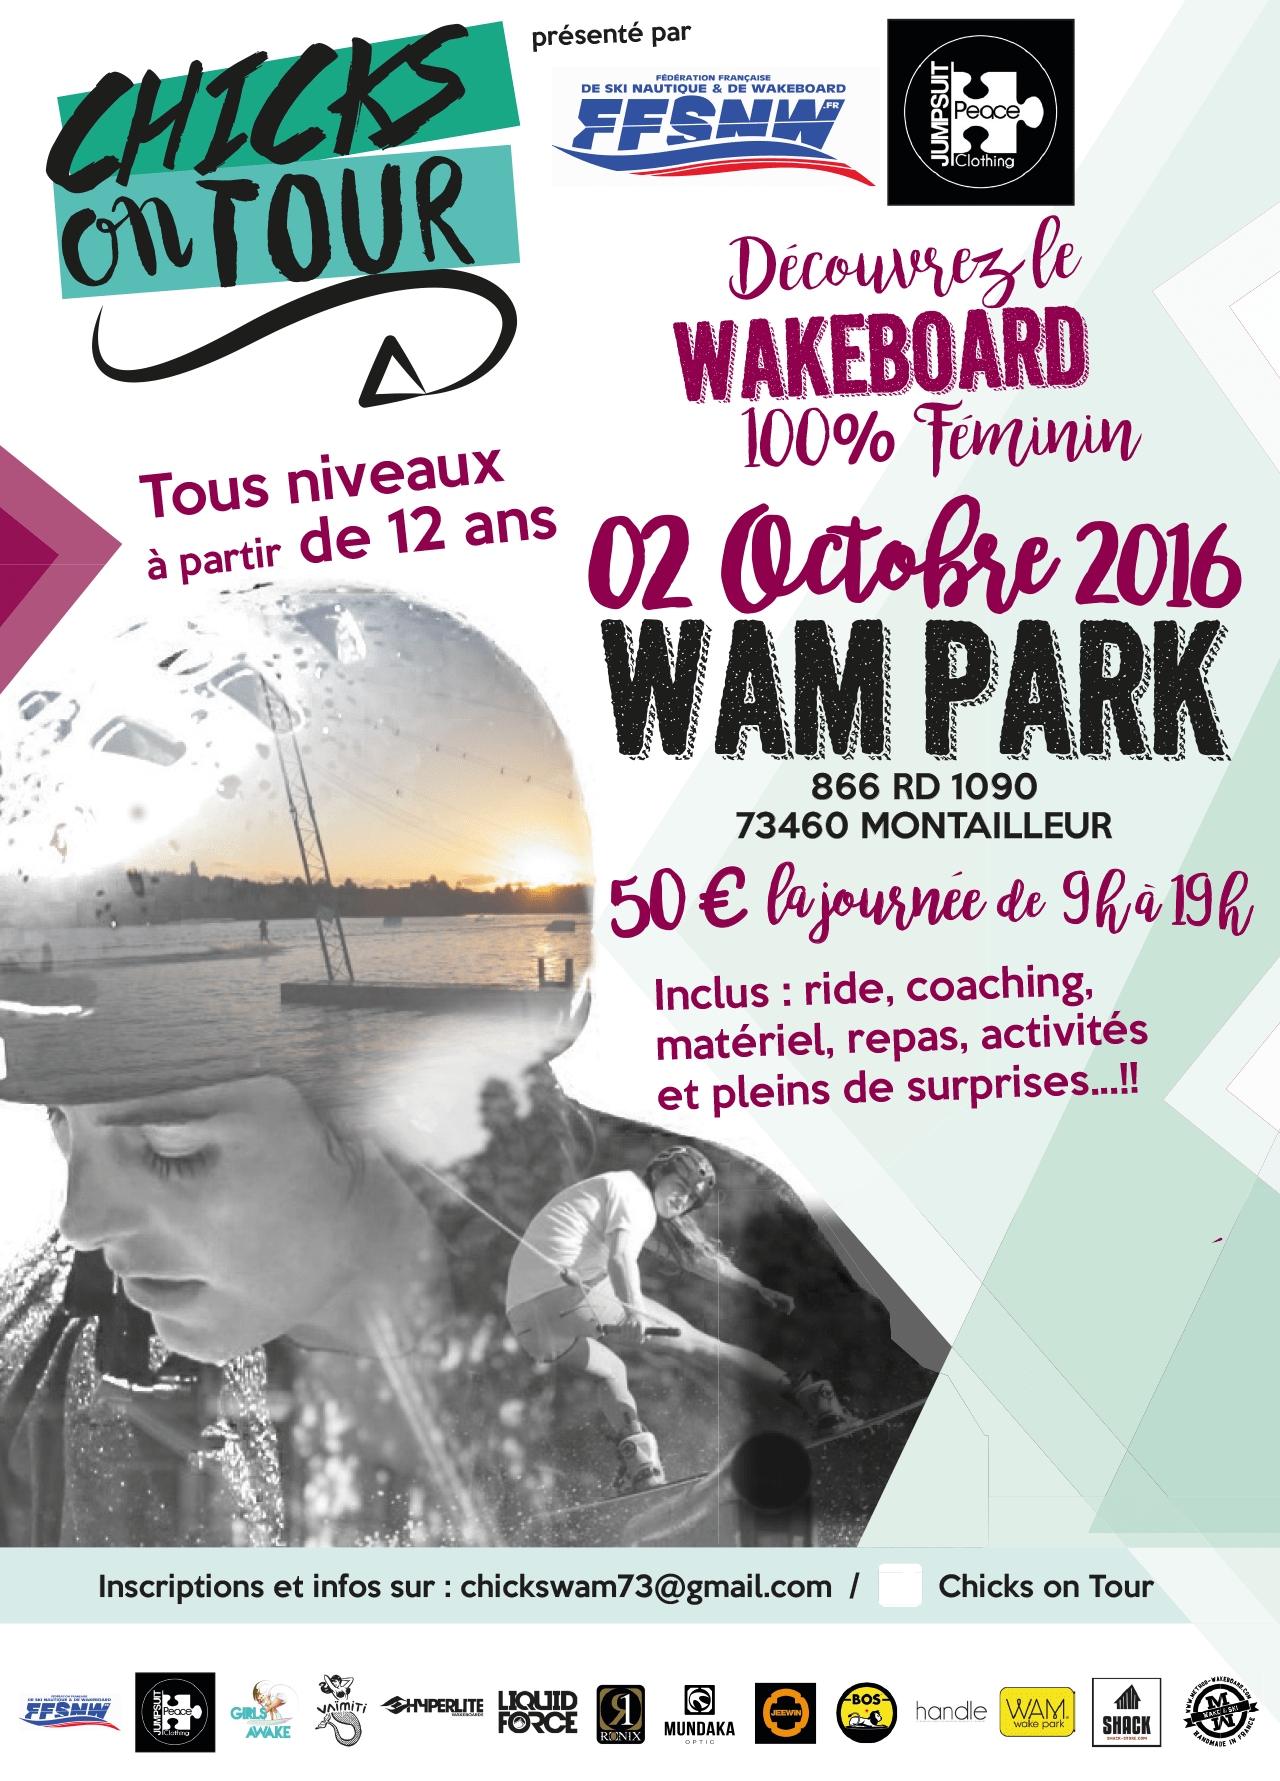 Chicks on tour ! Wake board 100% féminin